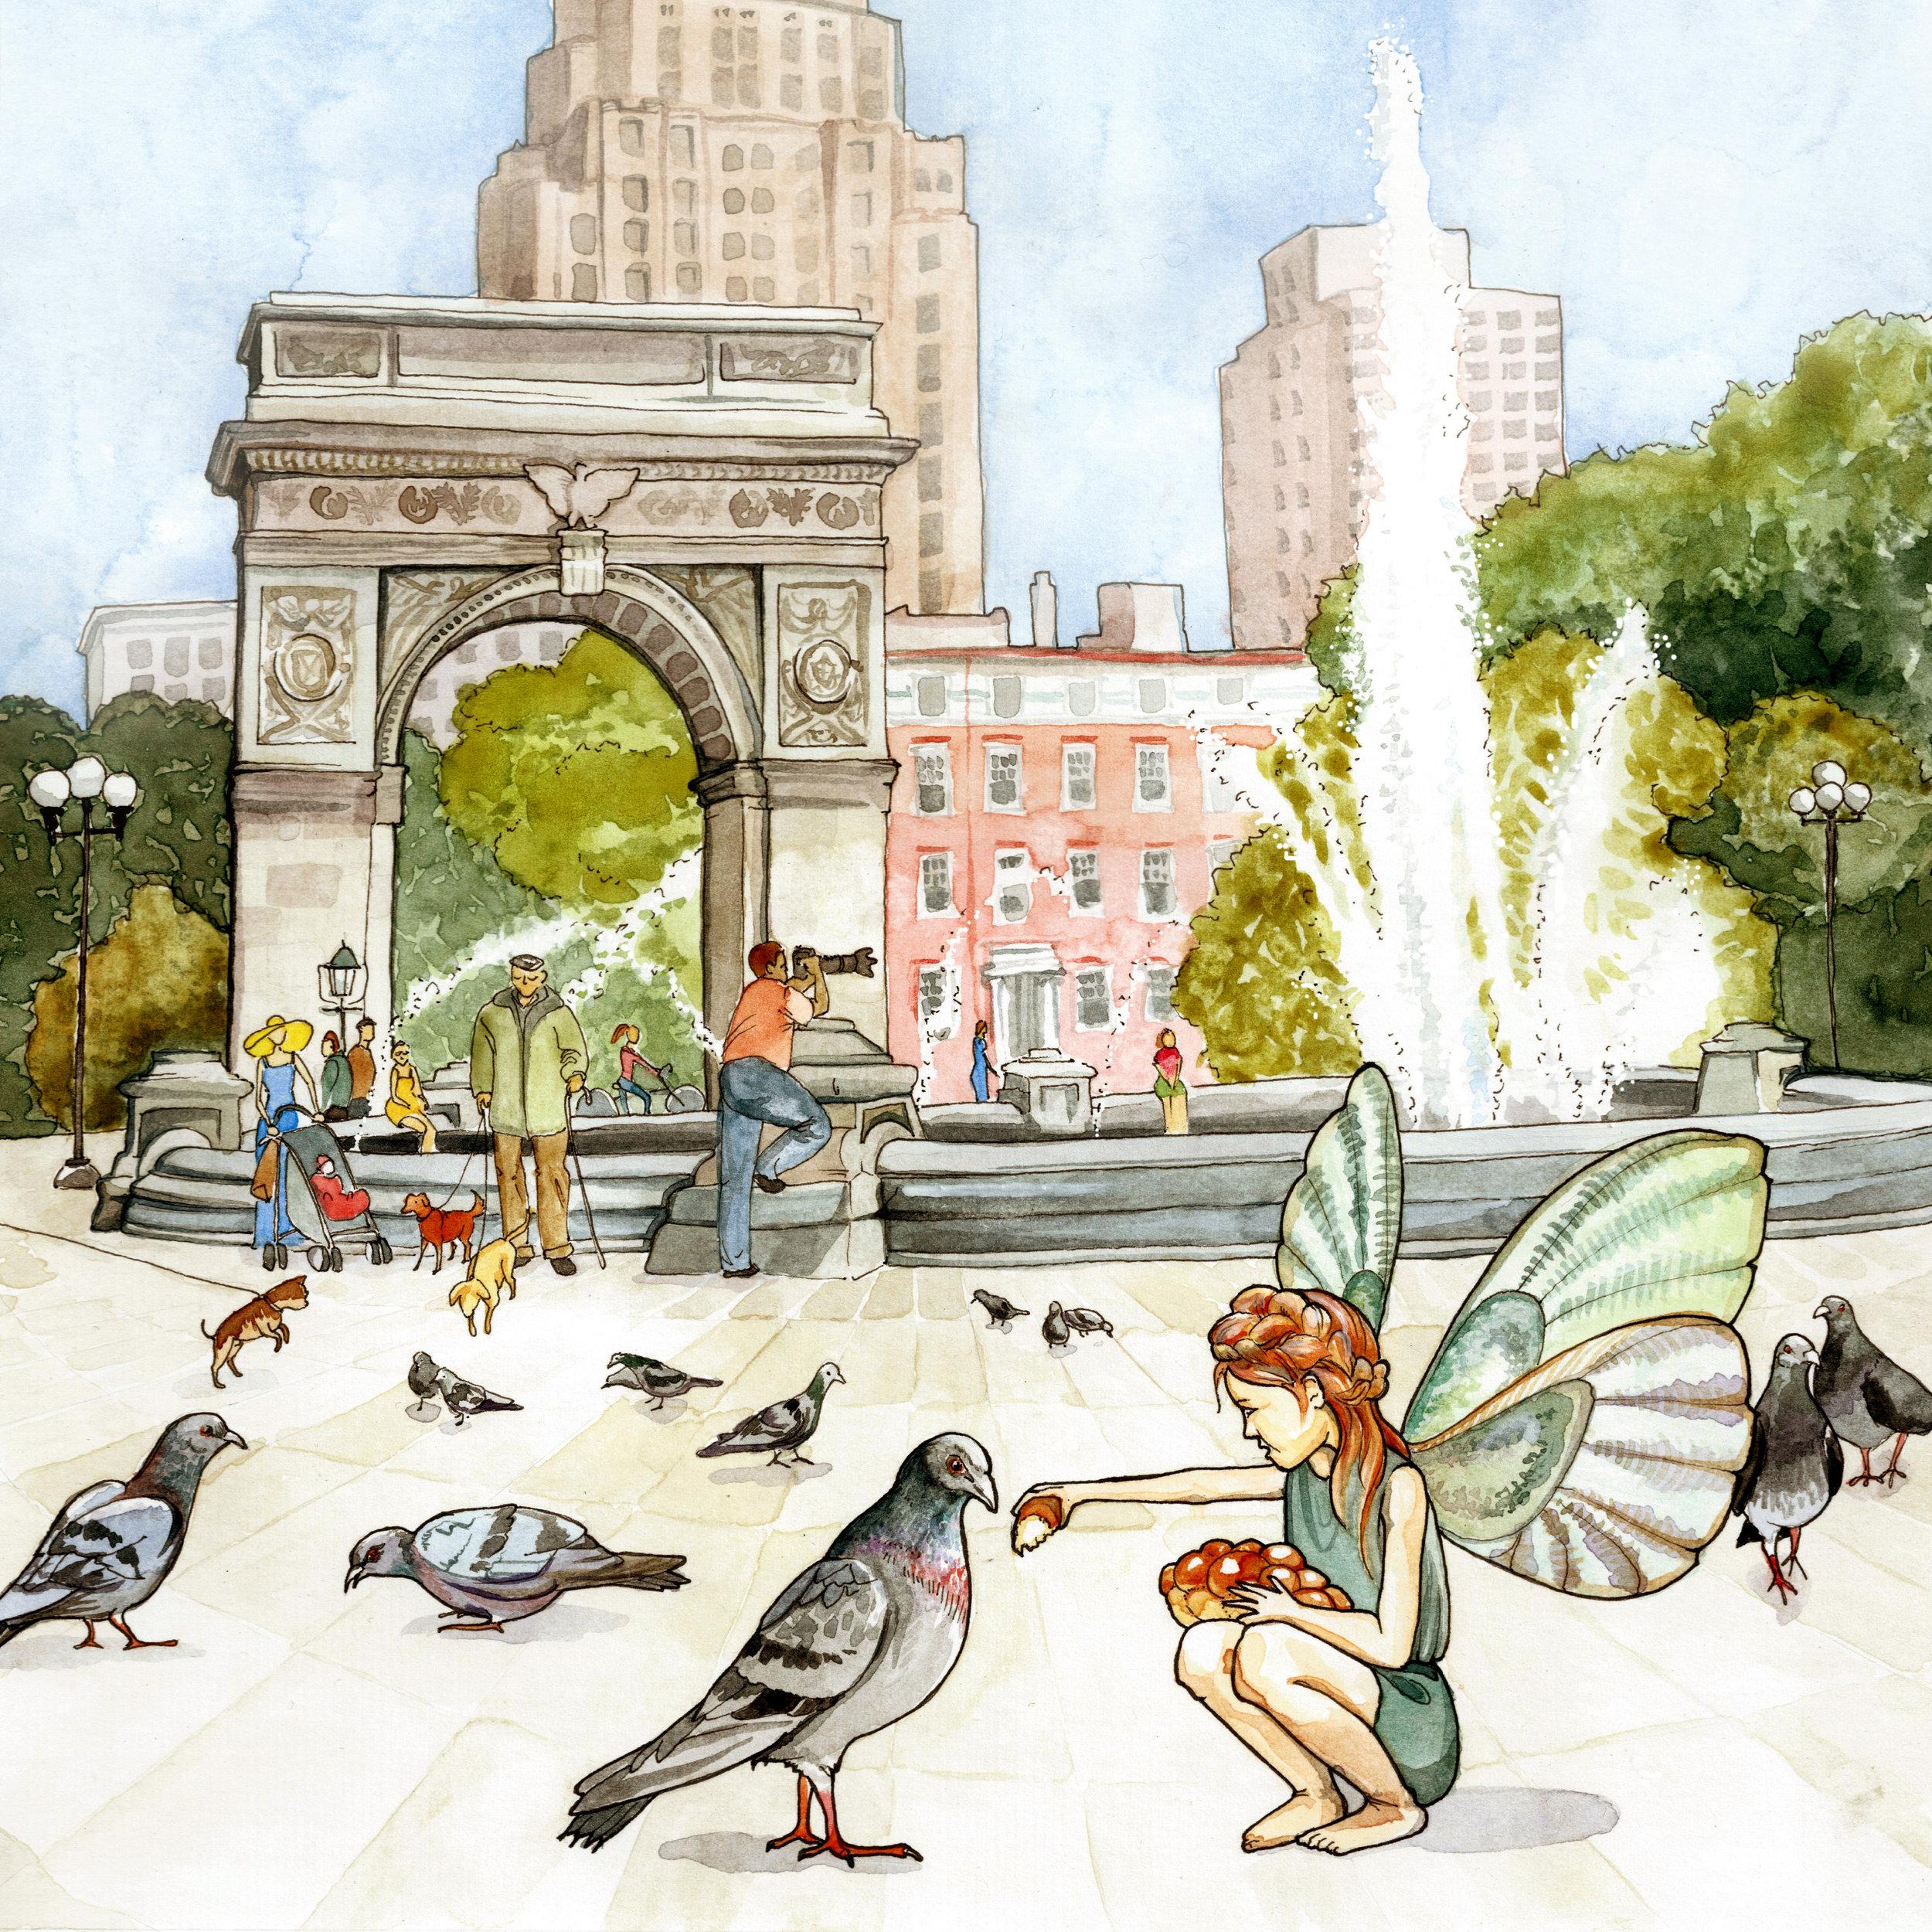 New York Edition: Washington Square Park